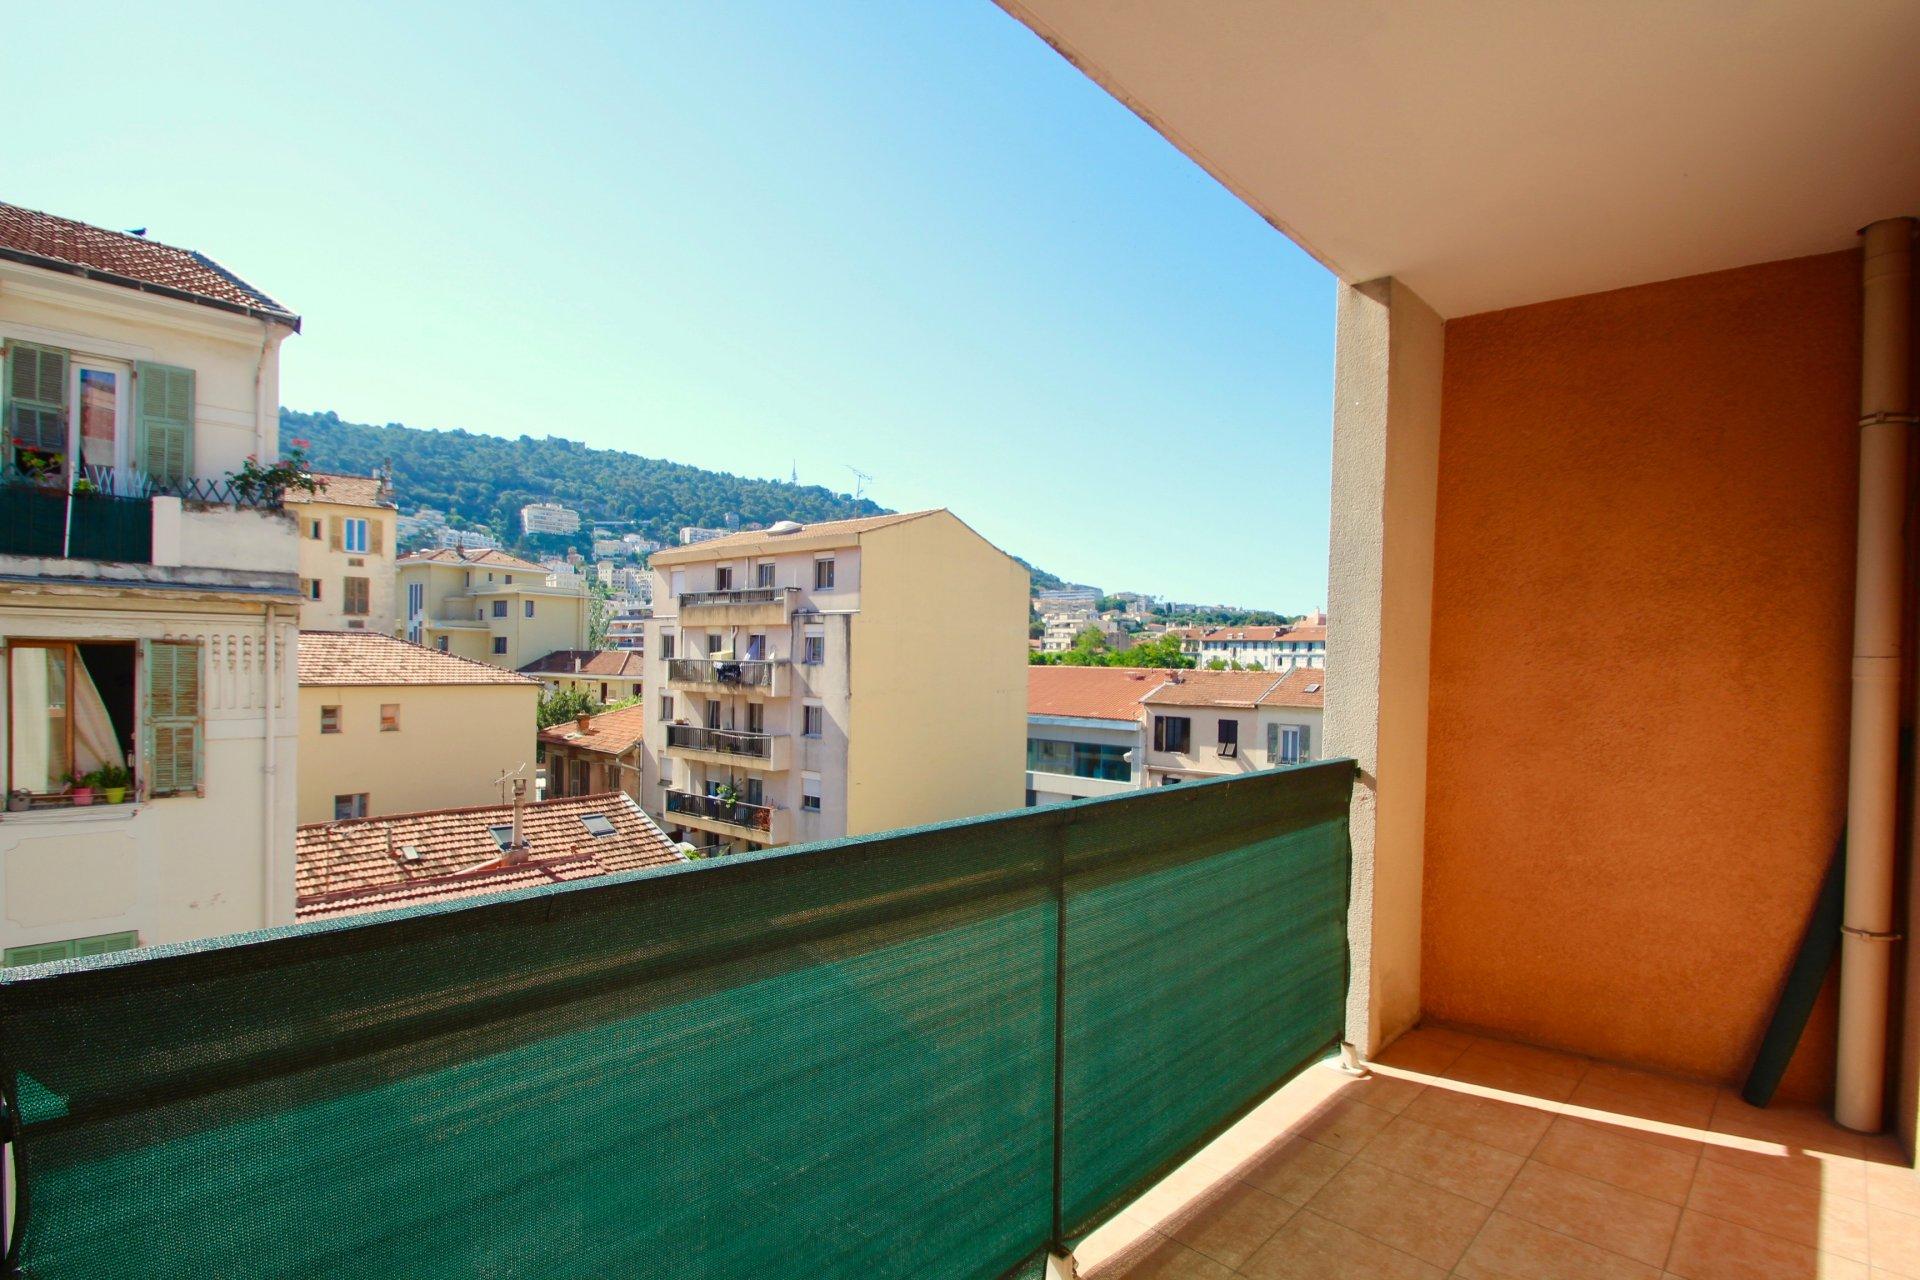 Location Appartement - Nice Saint Jean d'Angély